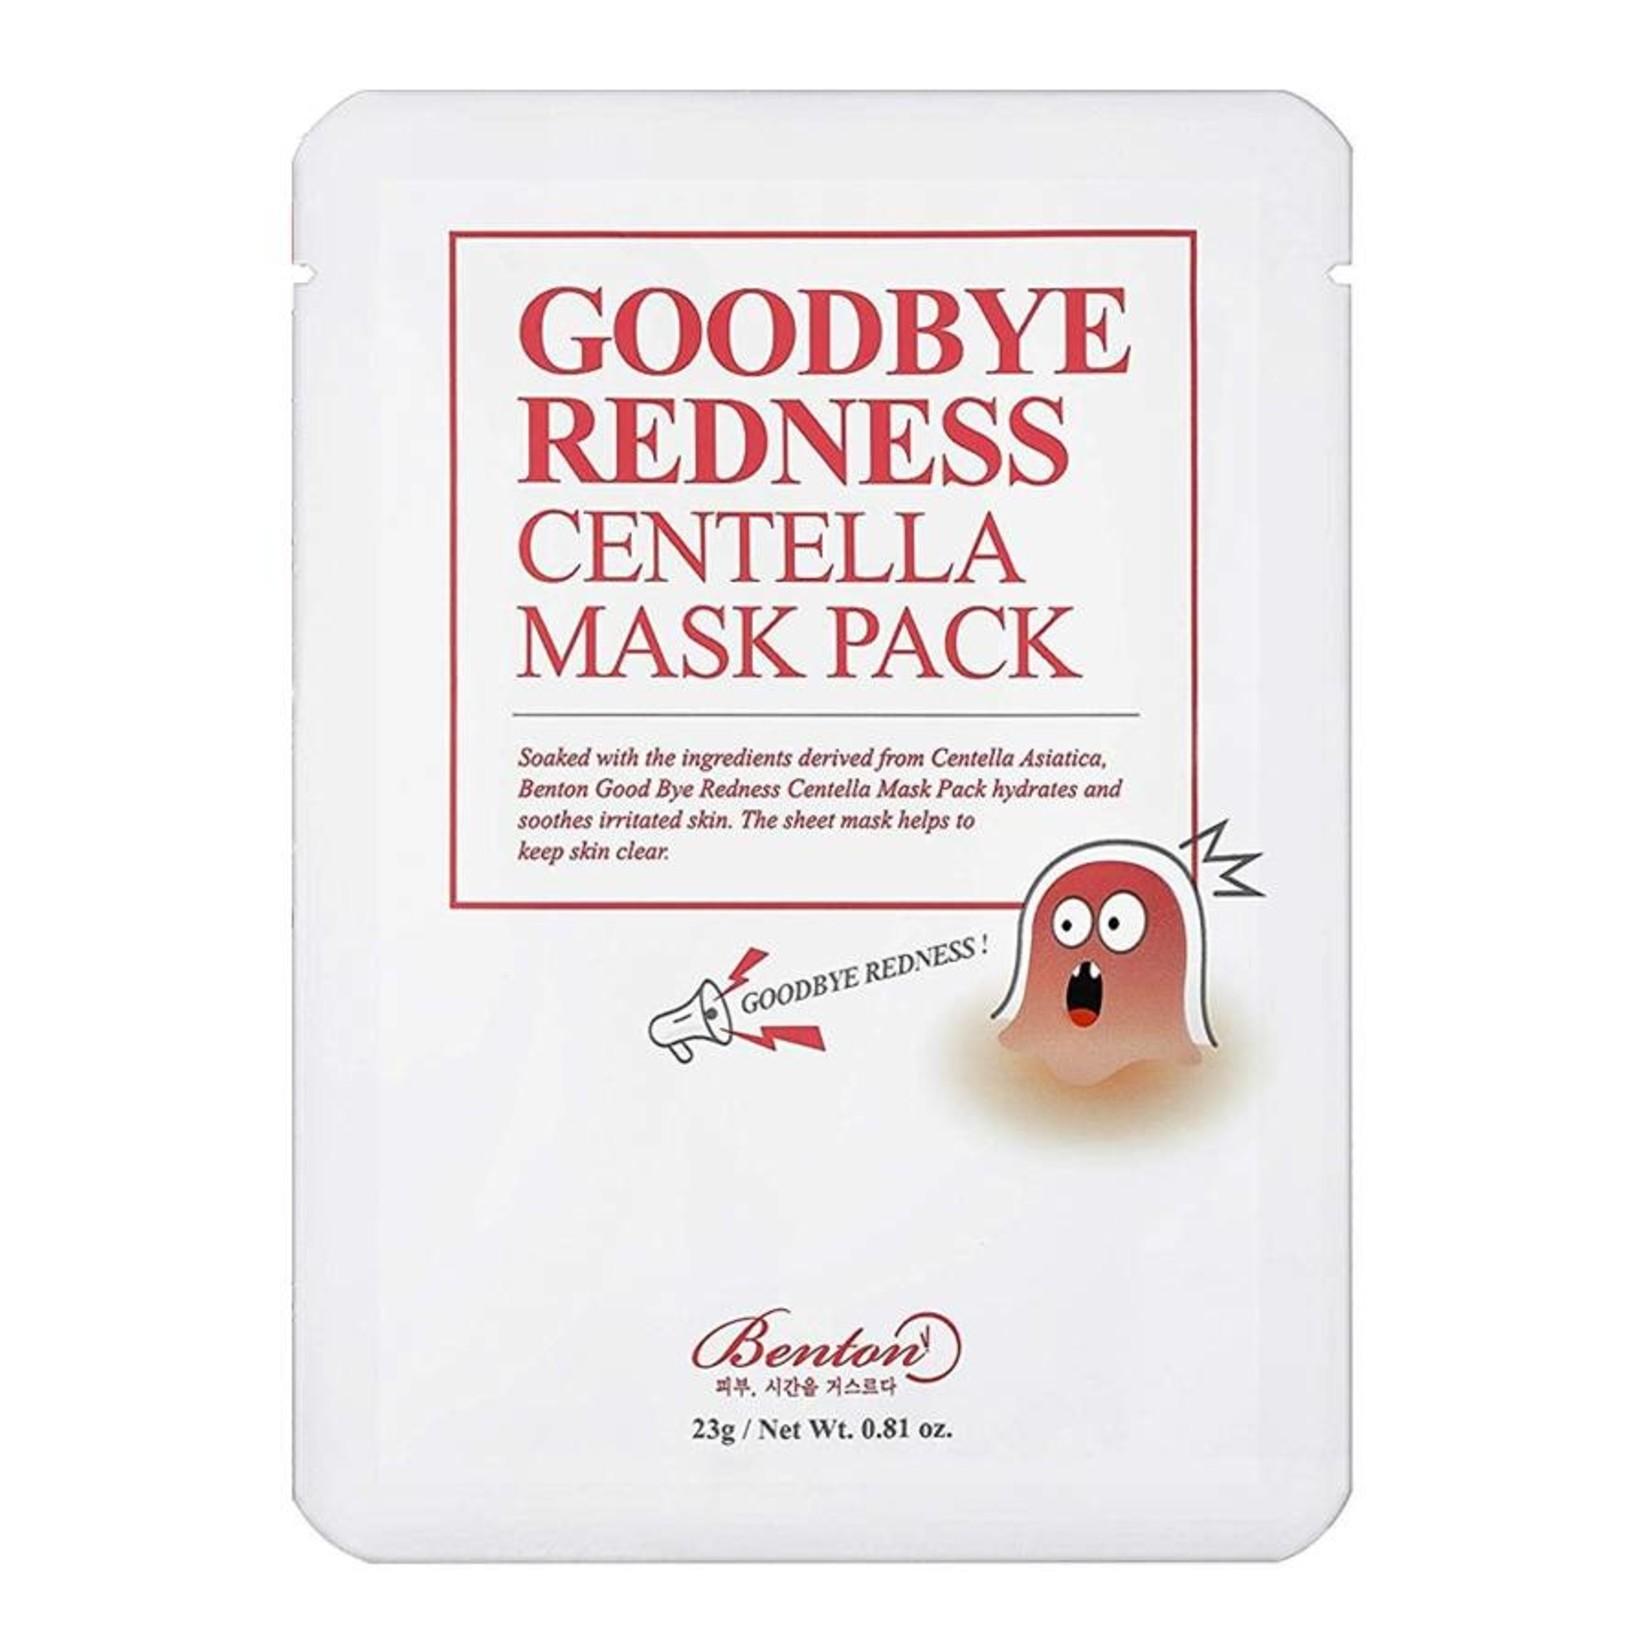 Benton Goodbye Redness Centella Mask Pack 10 pcs